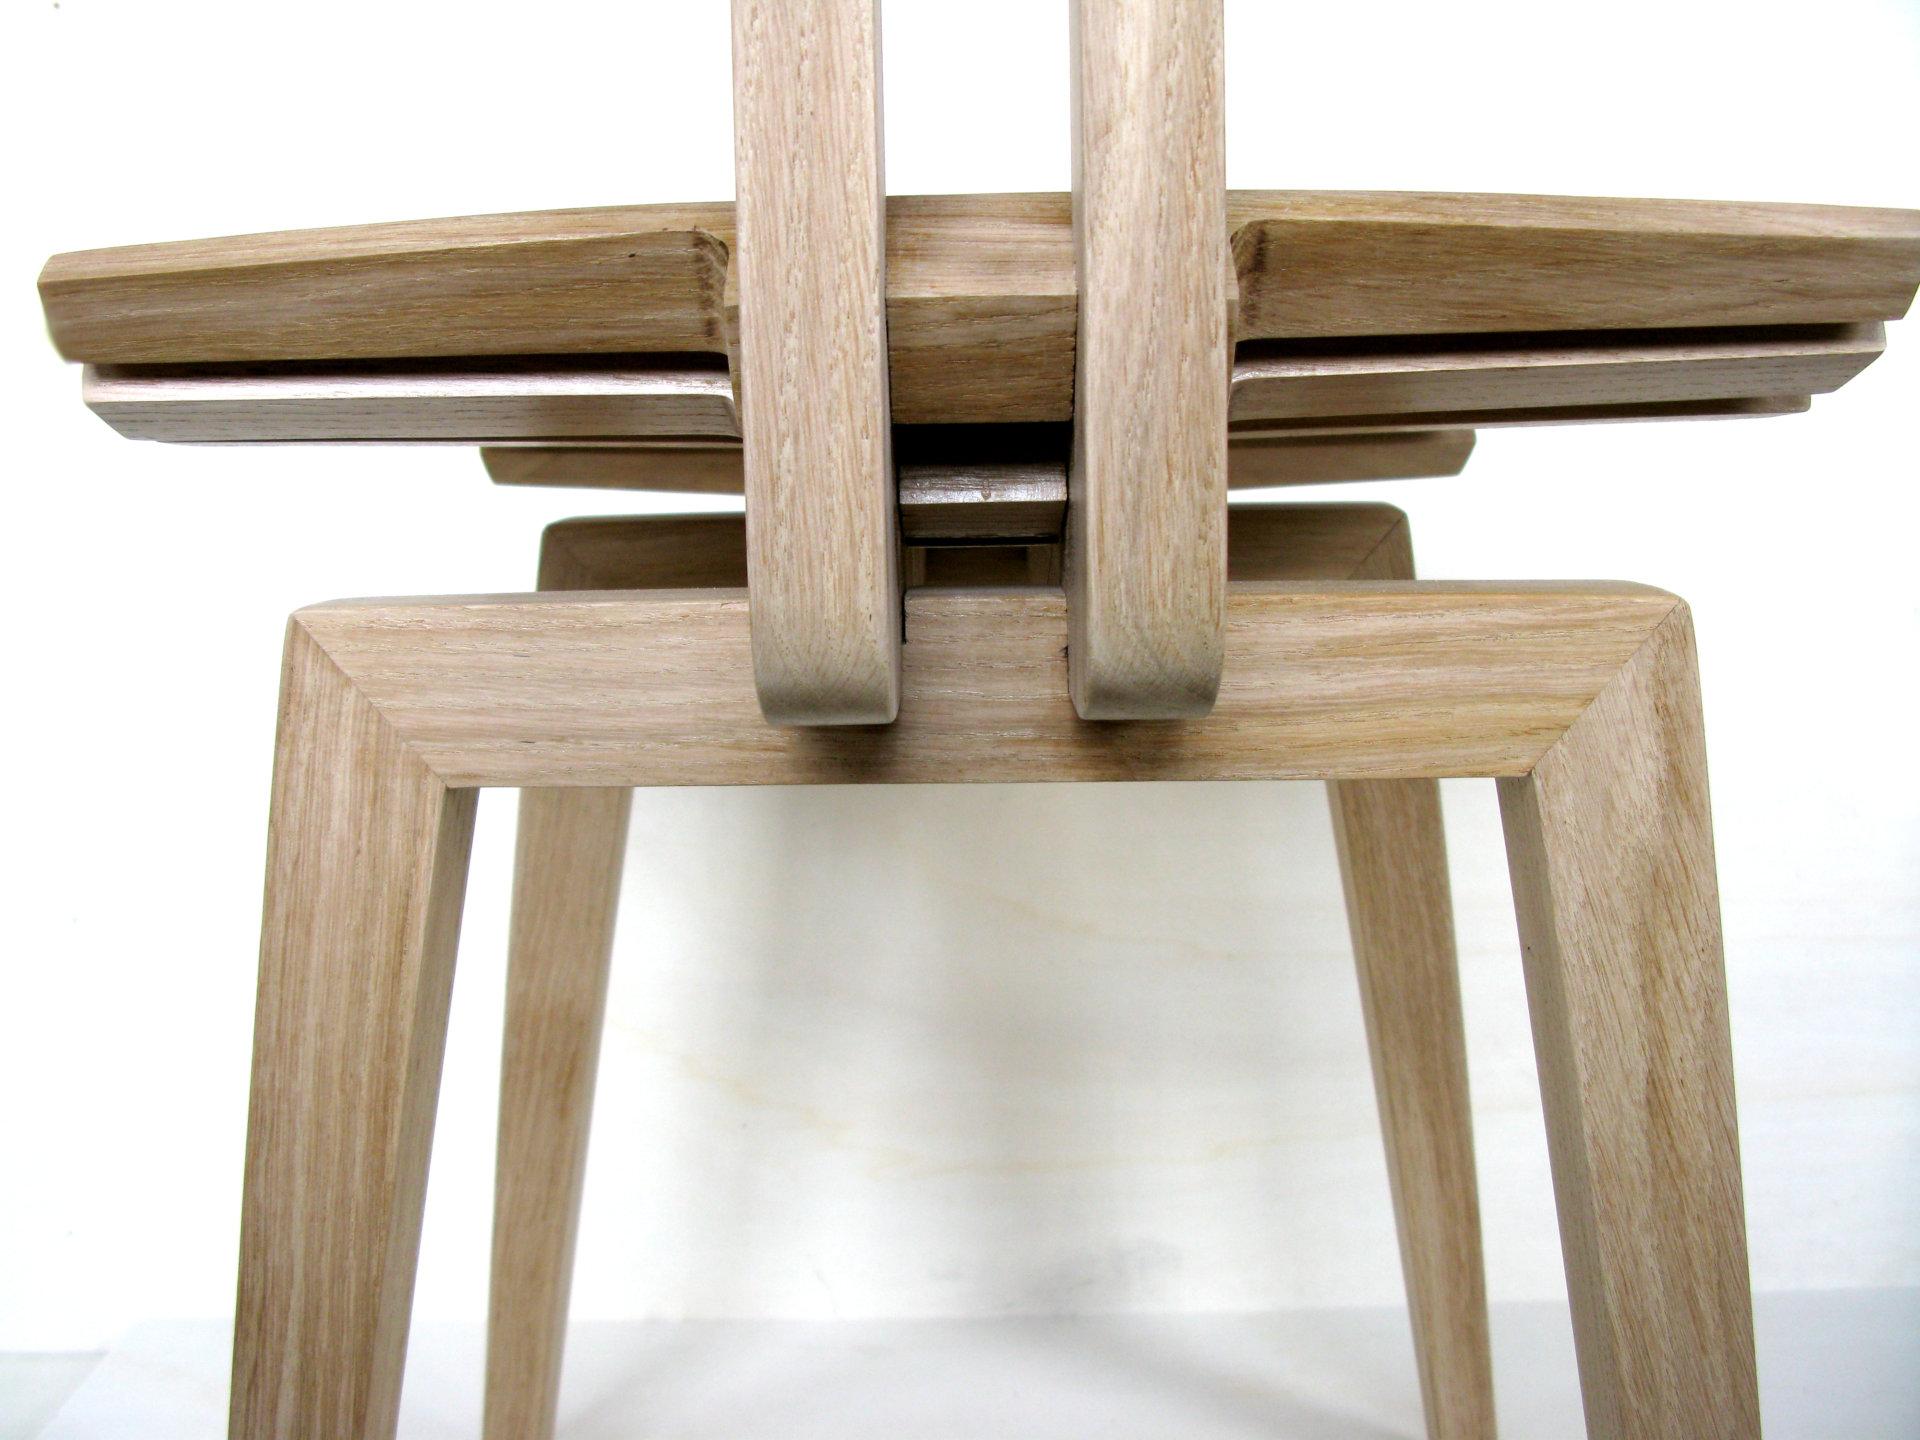 vincent criniere chaise. Black Bedroom Furniture Sets. Home Design Ideas